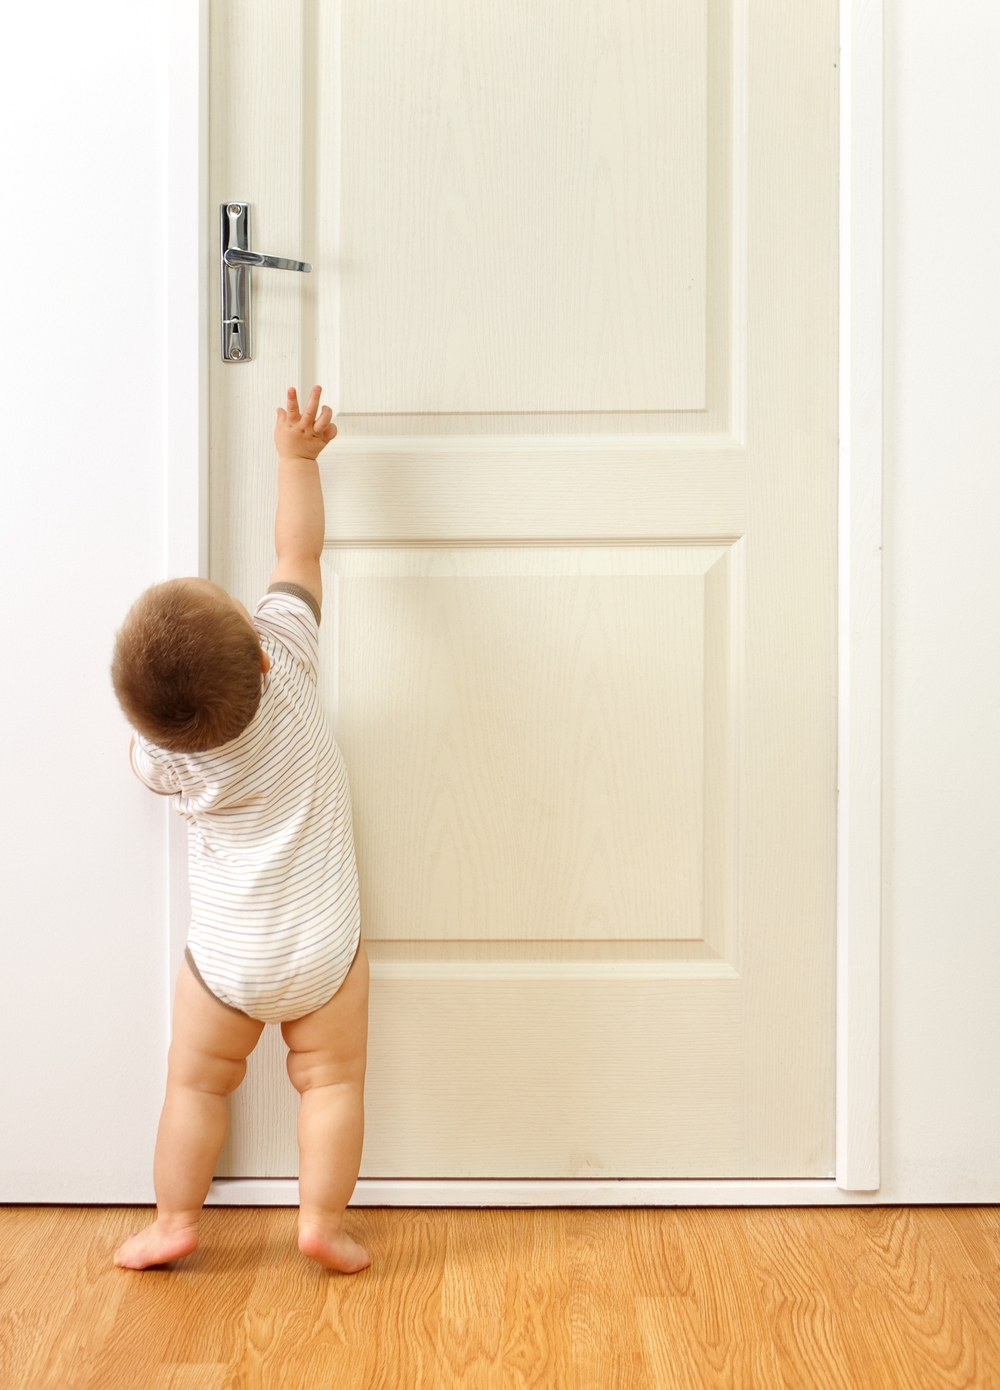 Baby boy reaching for door handle. & How to childproof doors \u2014 Baby Proofing Tips and Childproofing Advice